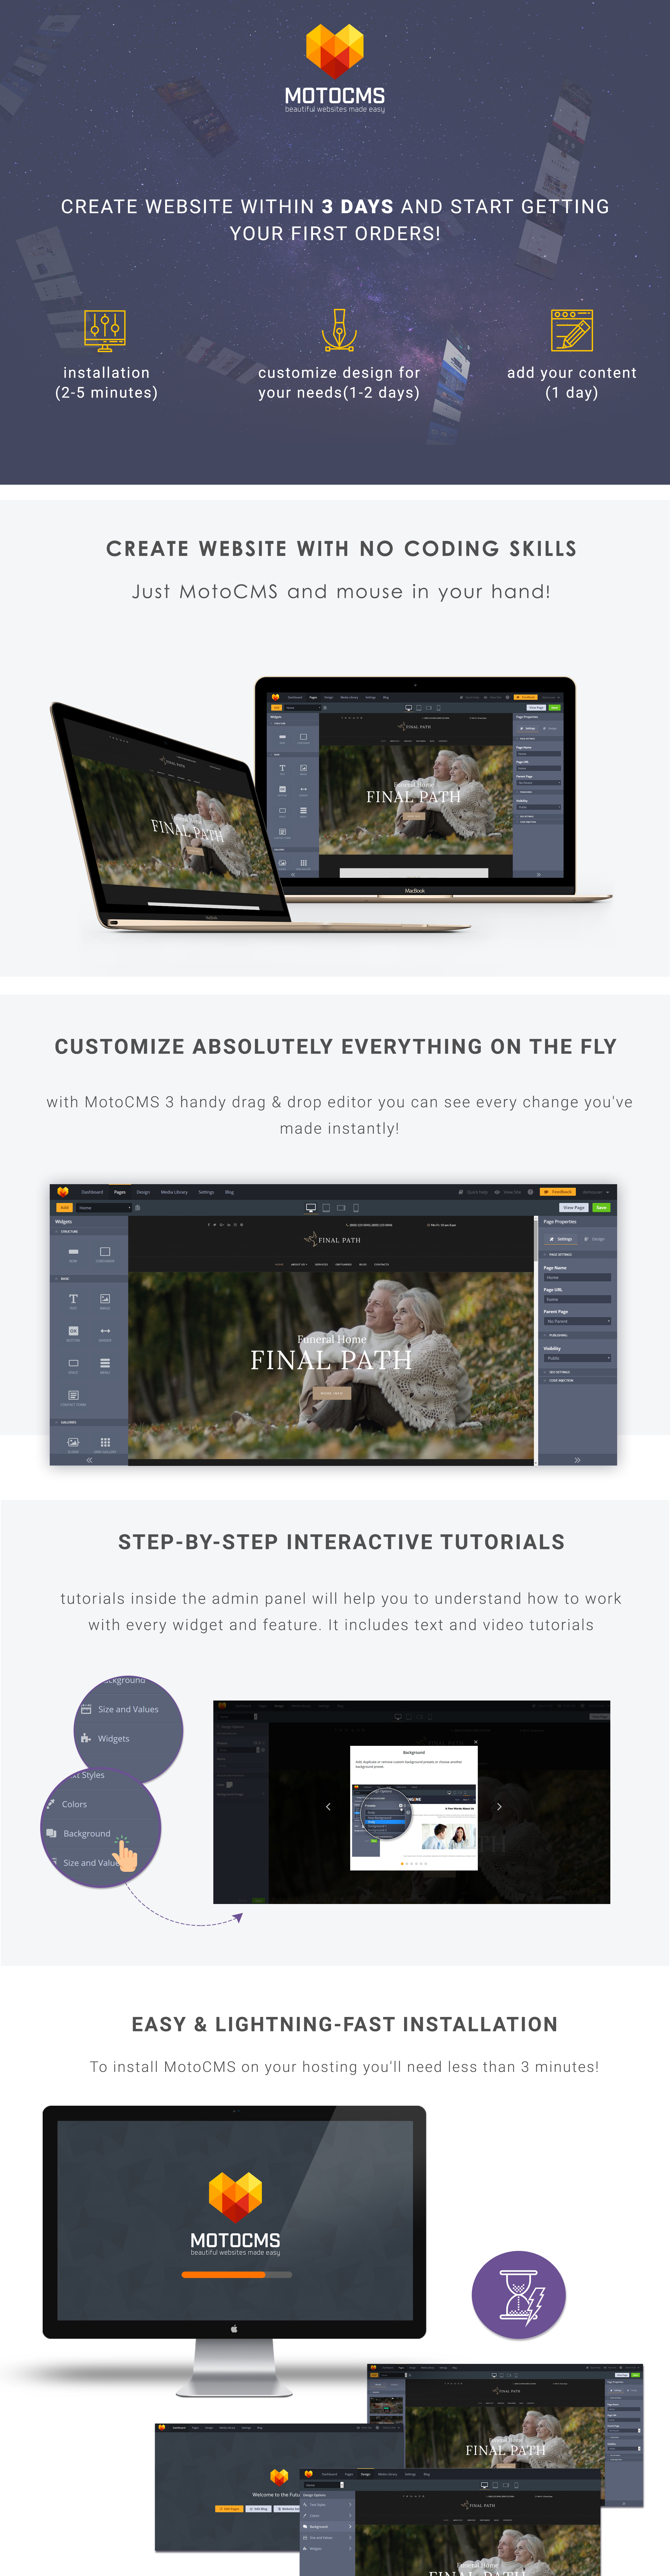 Funeral Home Website Design For Funeral Services Motocms